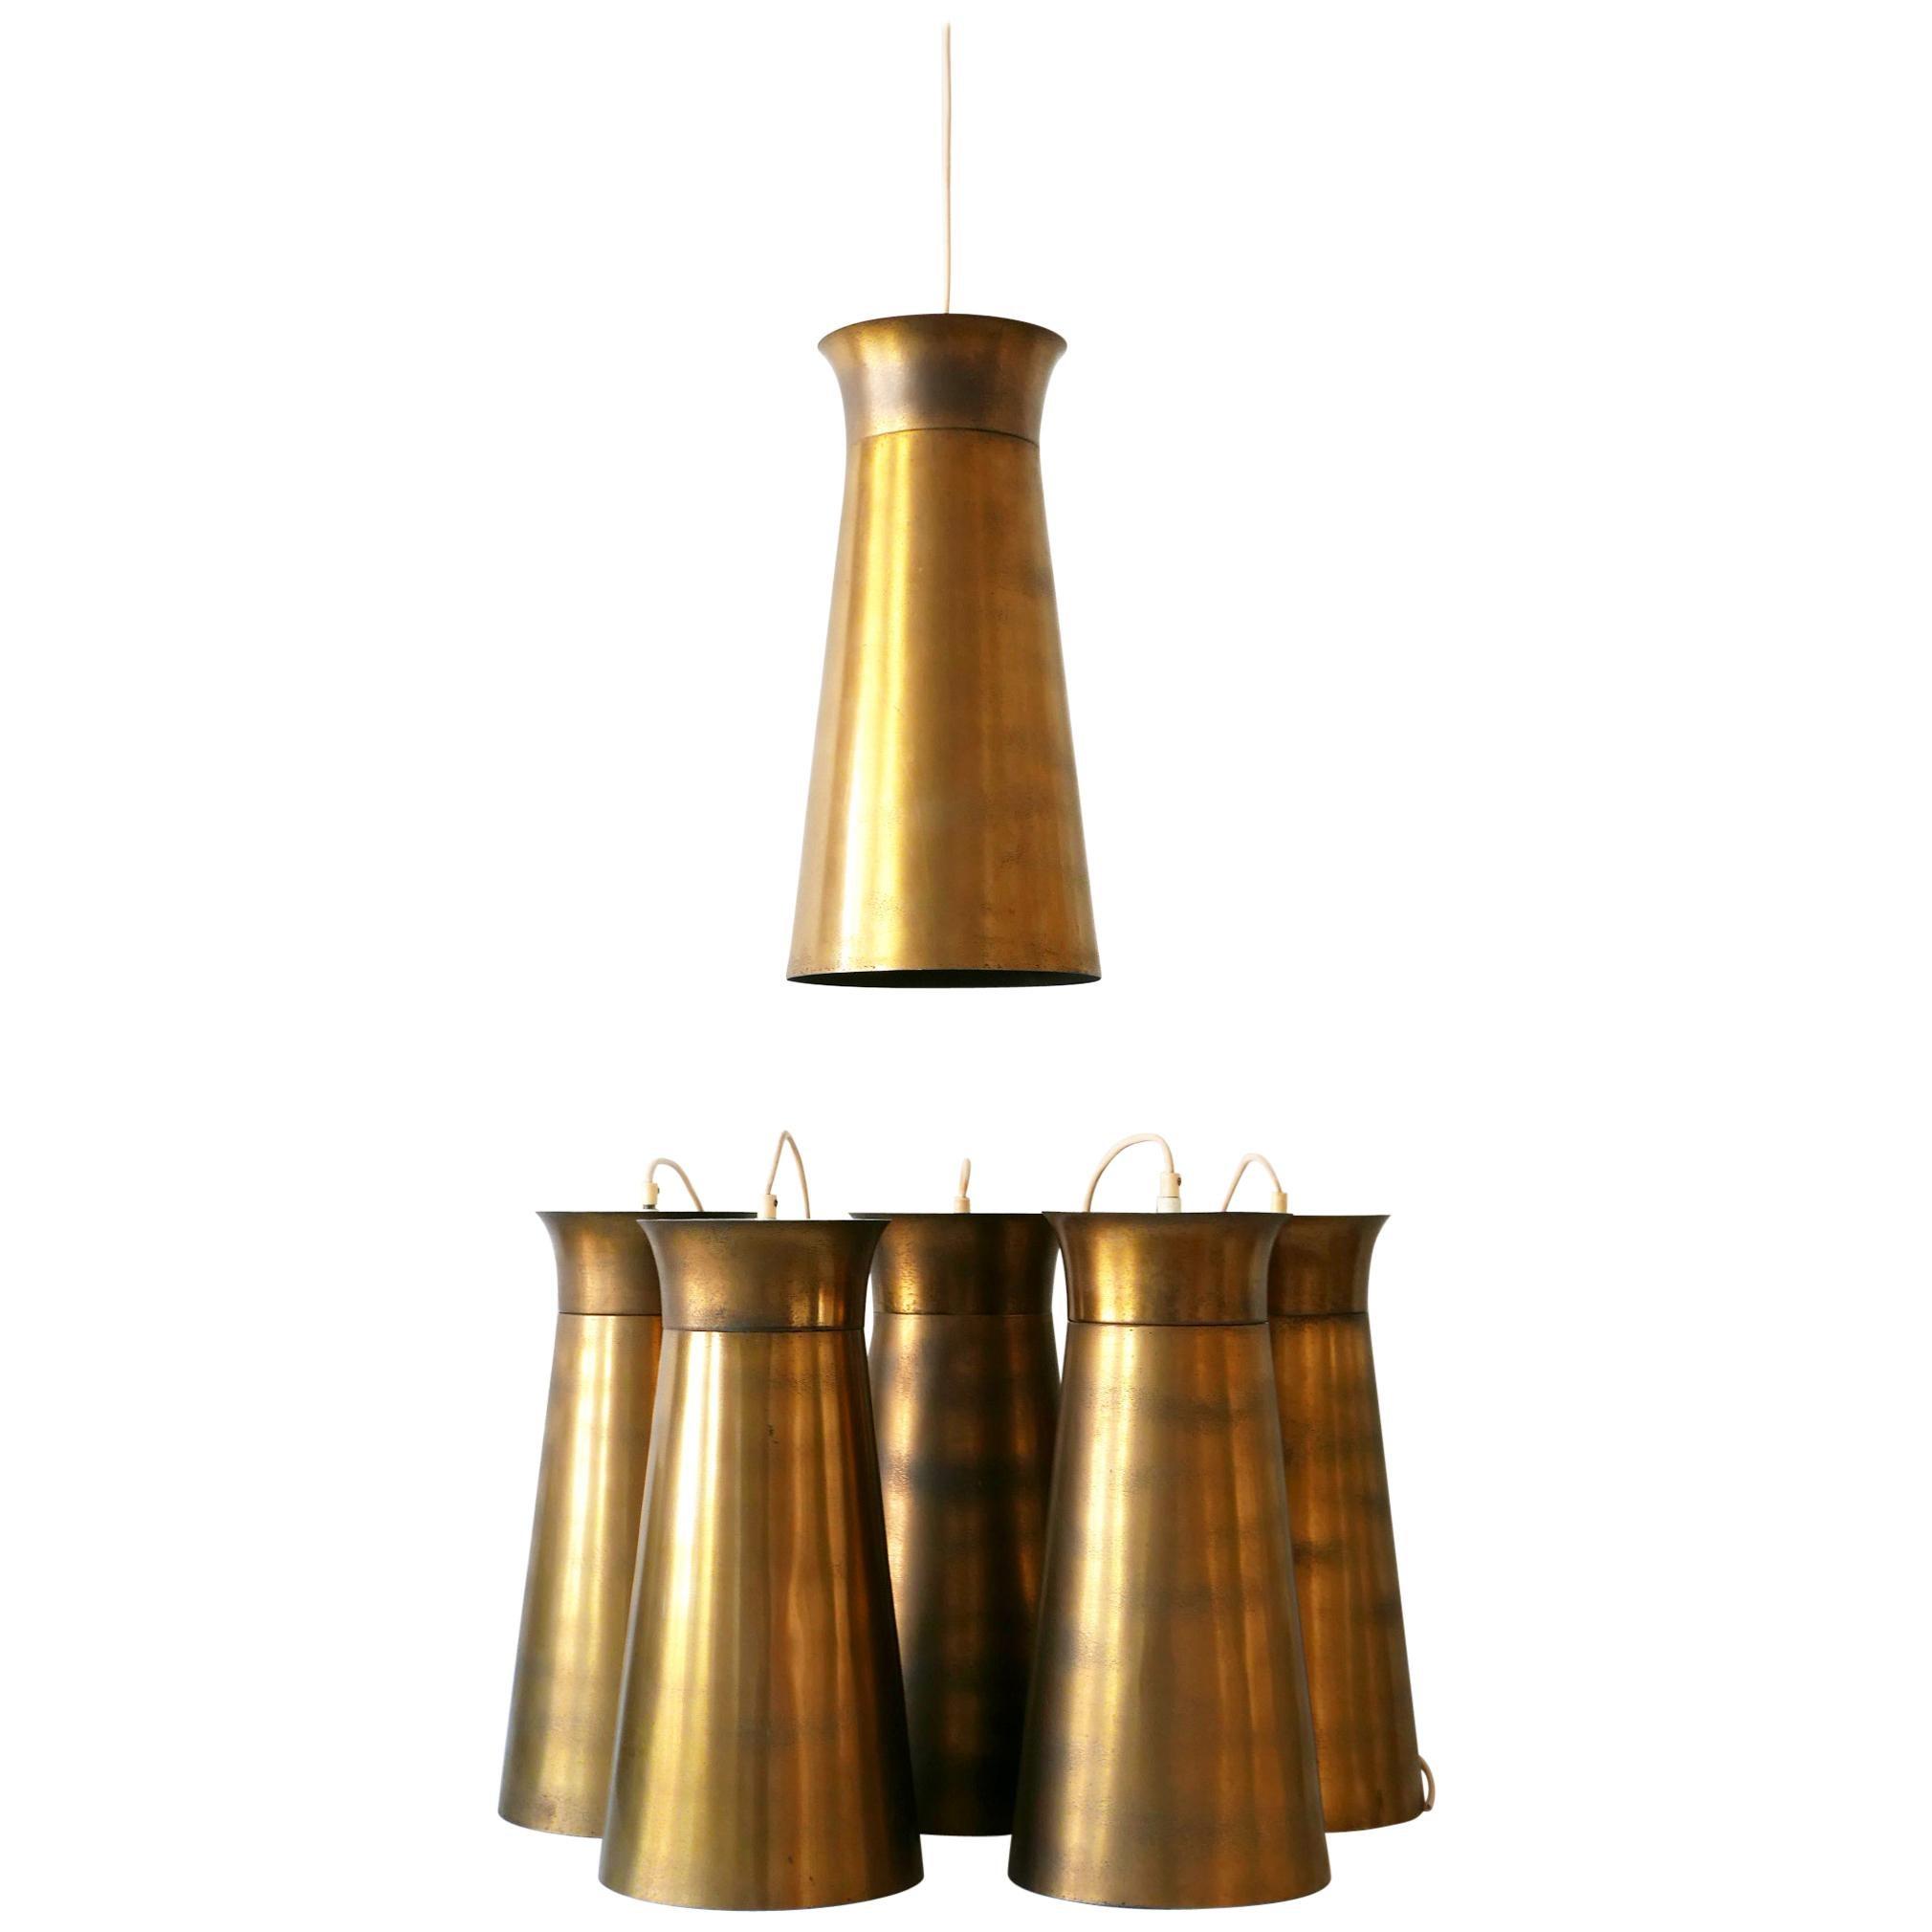 Elegant Mid-Century Modern Brass Pendant Lamps or Hanging Lights, 1950s, Germany